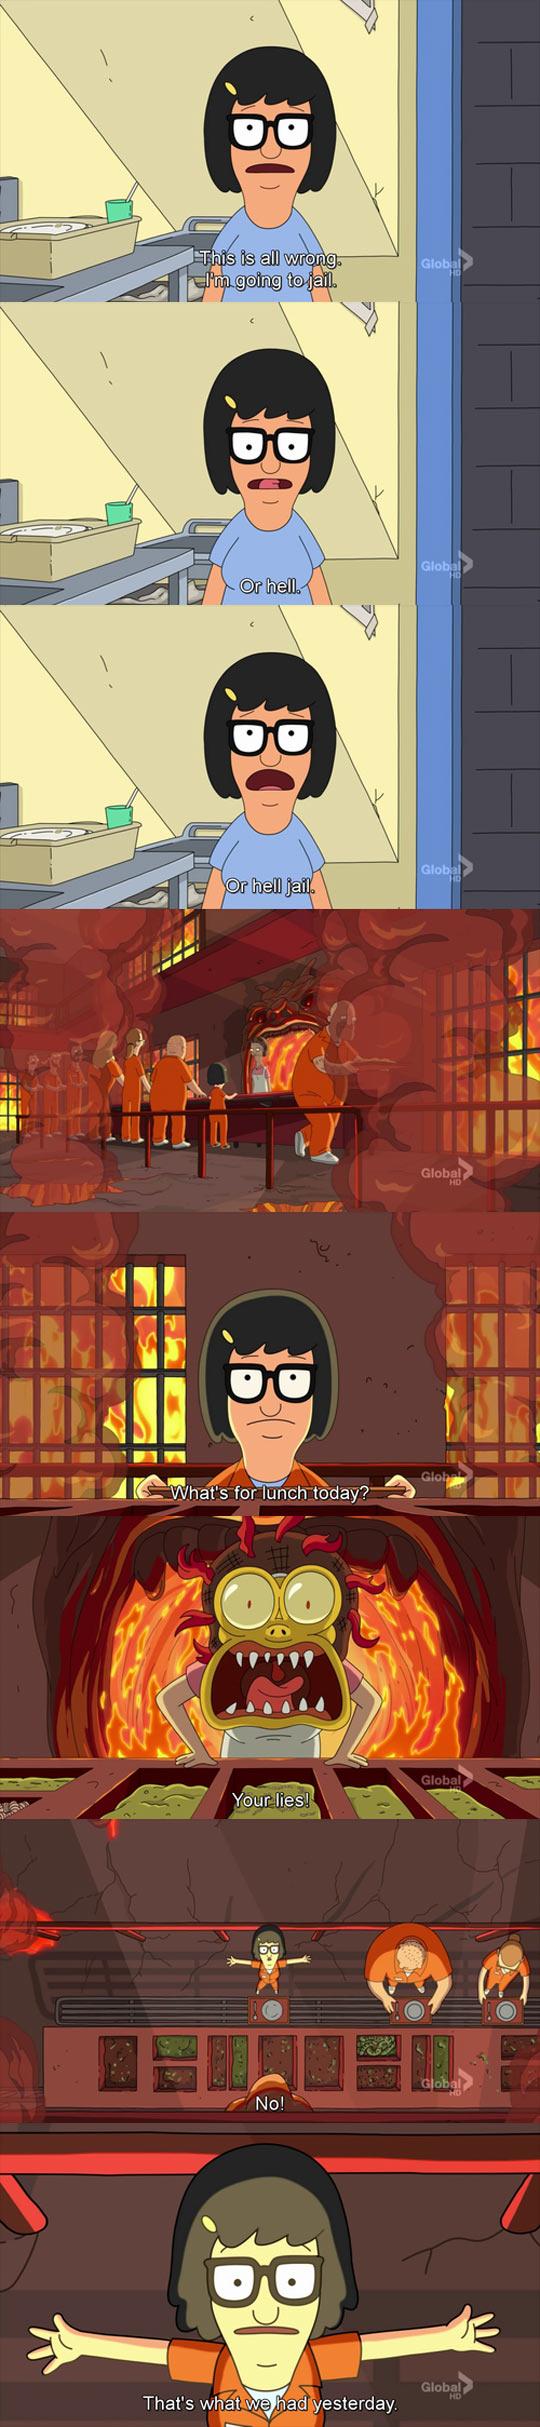 funny-Bob-Burger-jail-hell-food